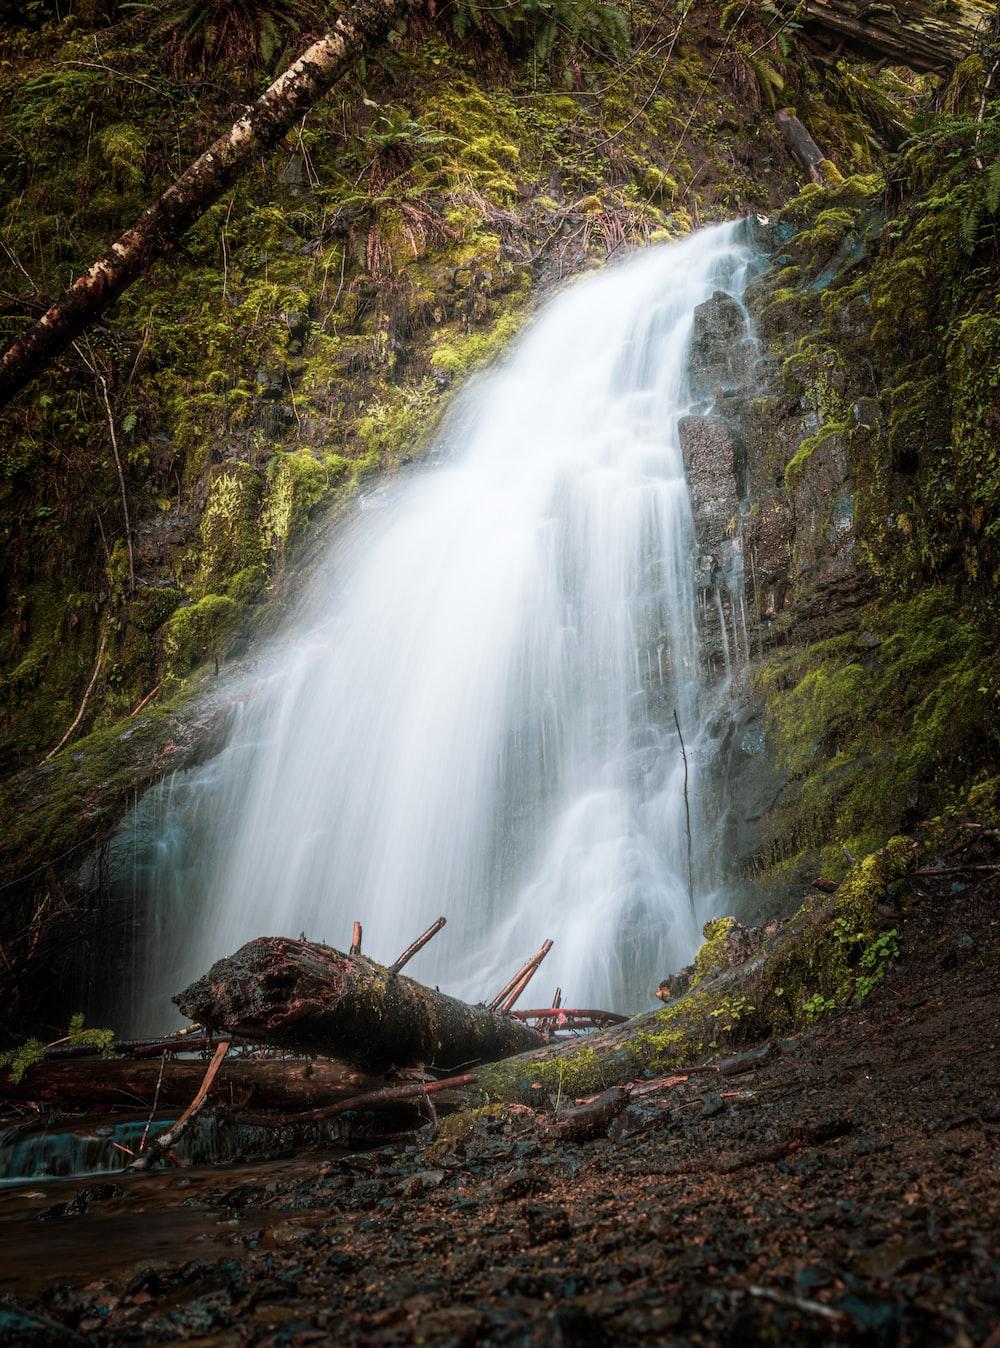 brown tree log near waterfalls